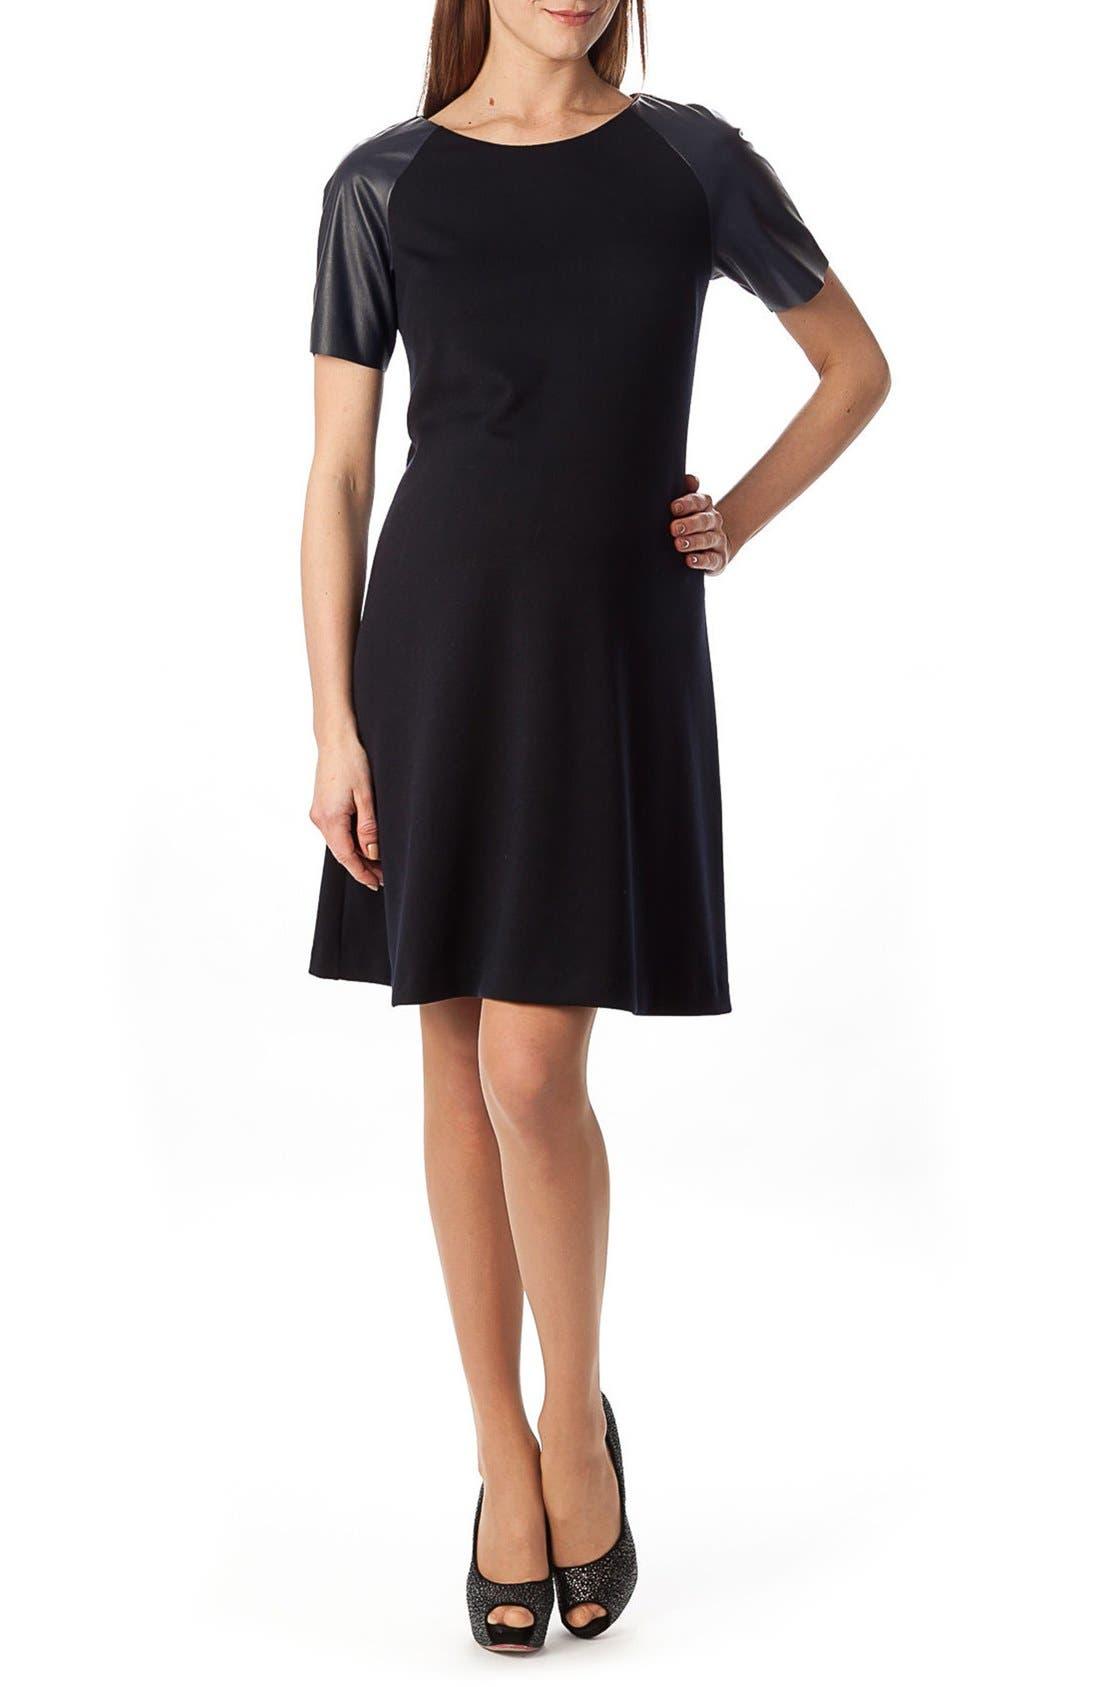 'Knightsbridge' A Line Maternity Dress,                             Main thumbnail 1, color,                             Dark Navy